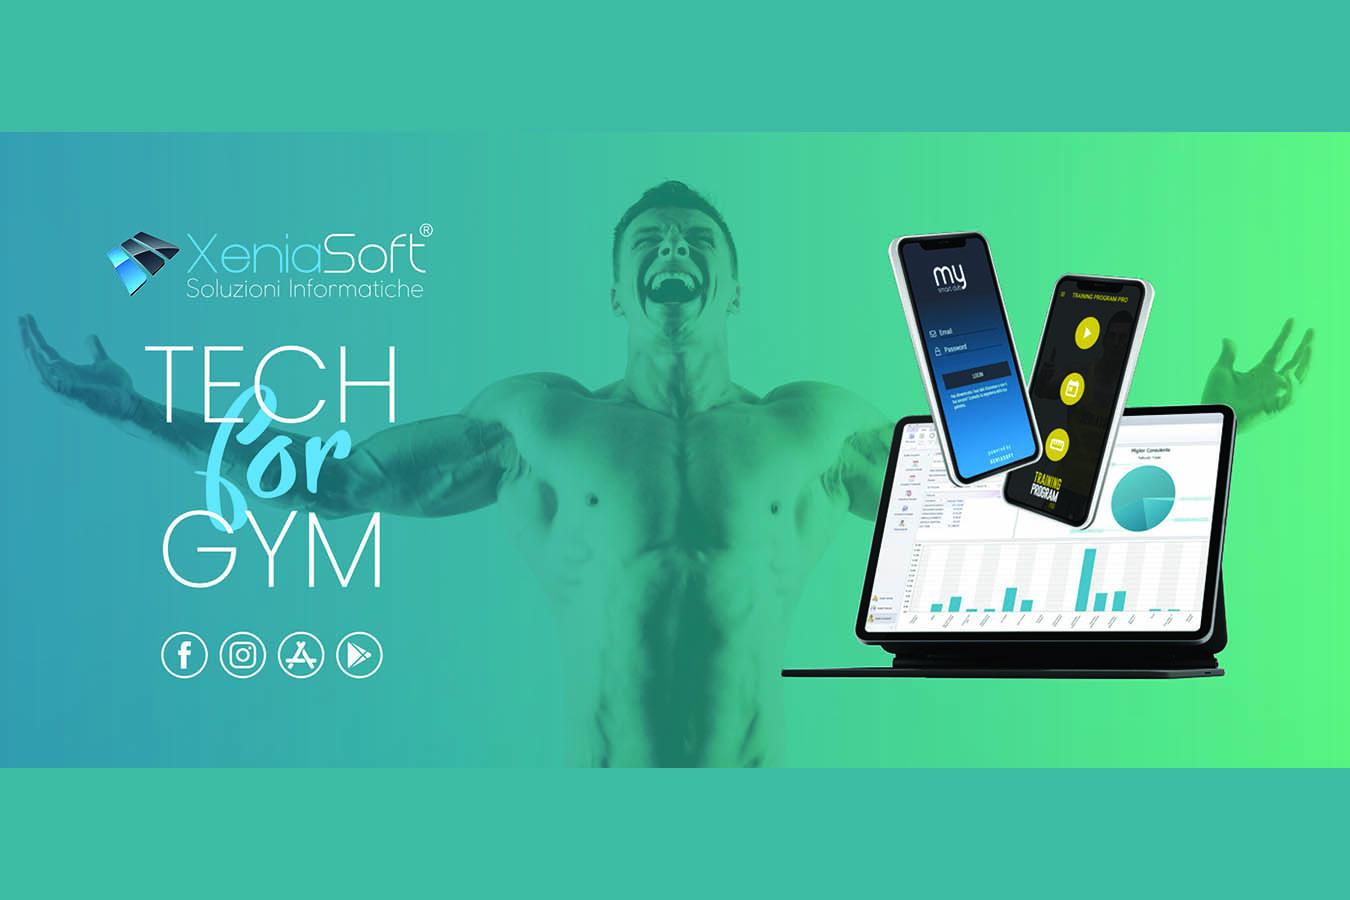 Xeniasoft tecnologie innovative per il fitness made in Italy